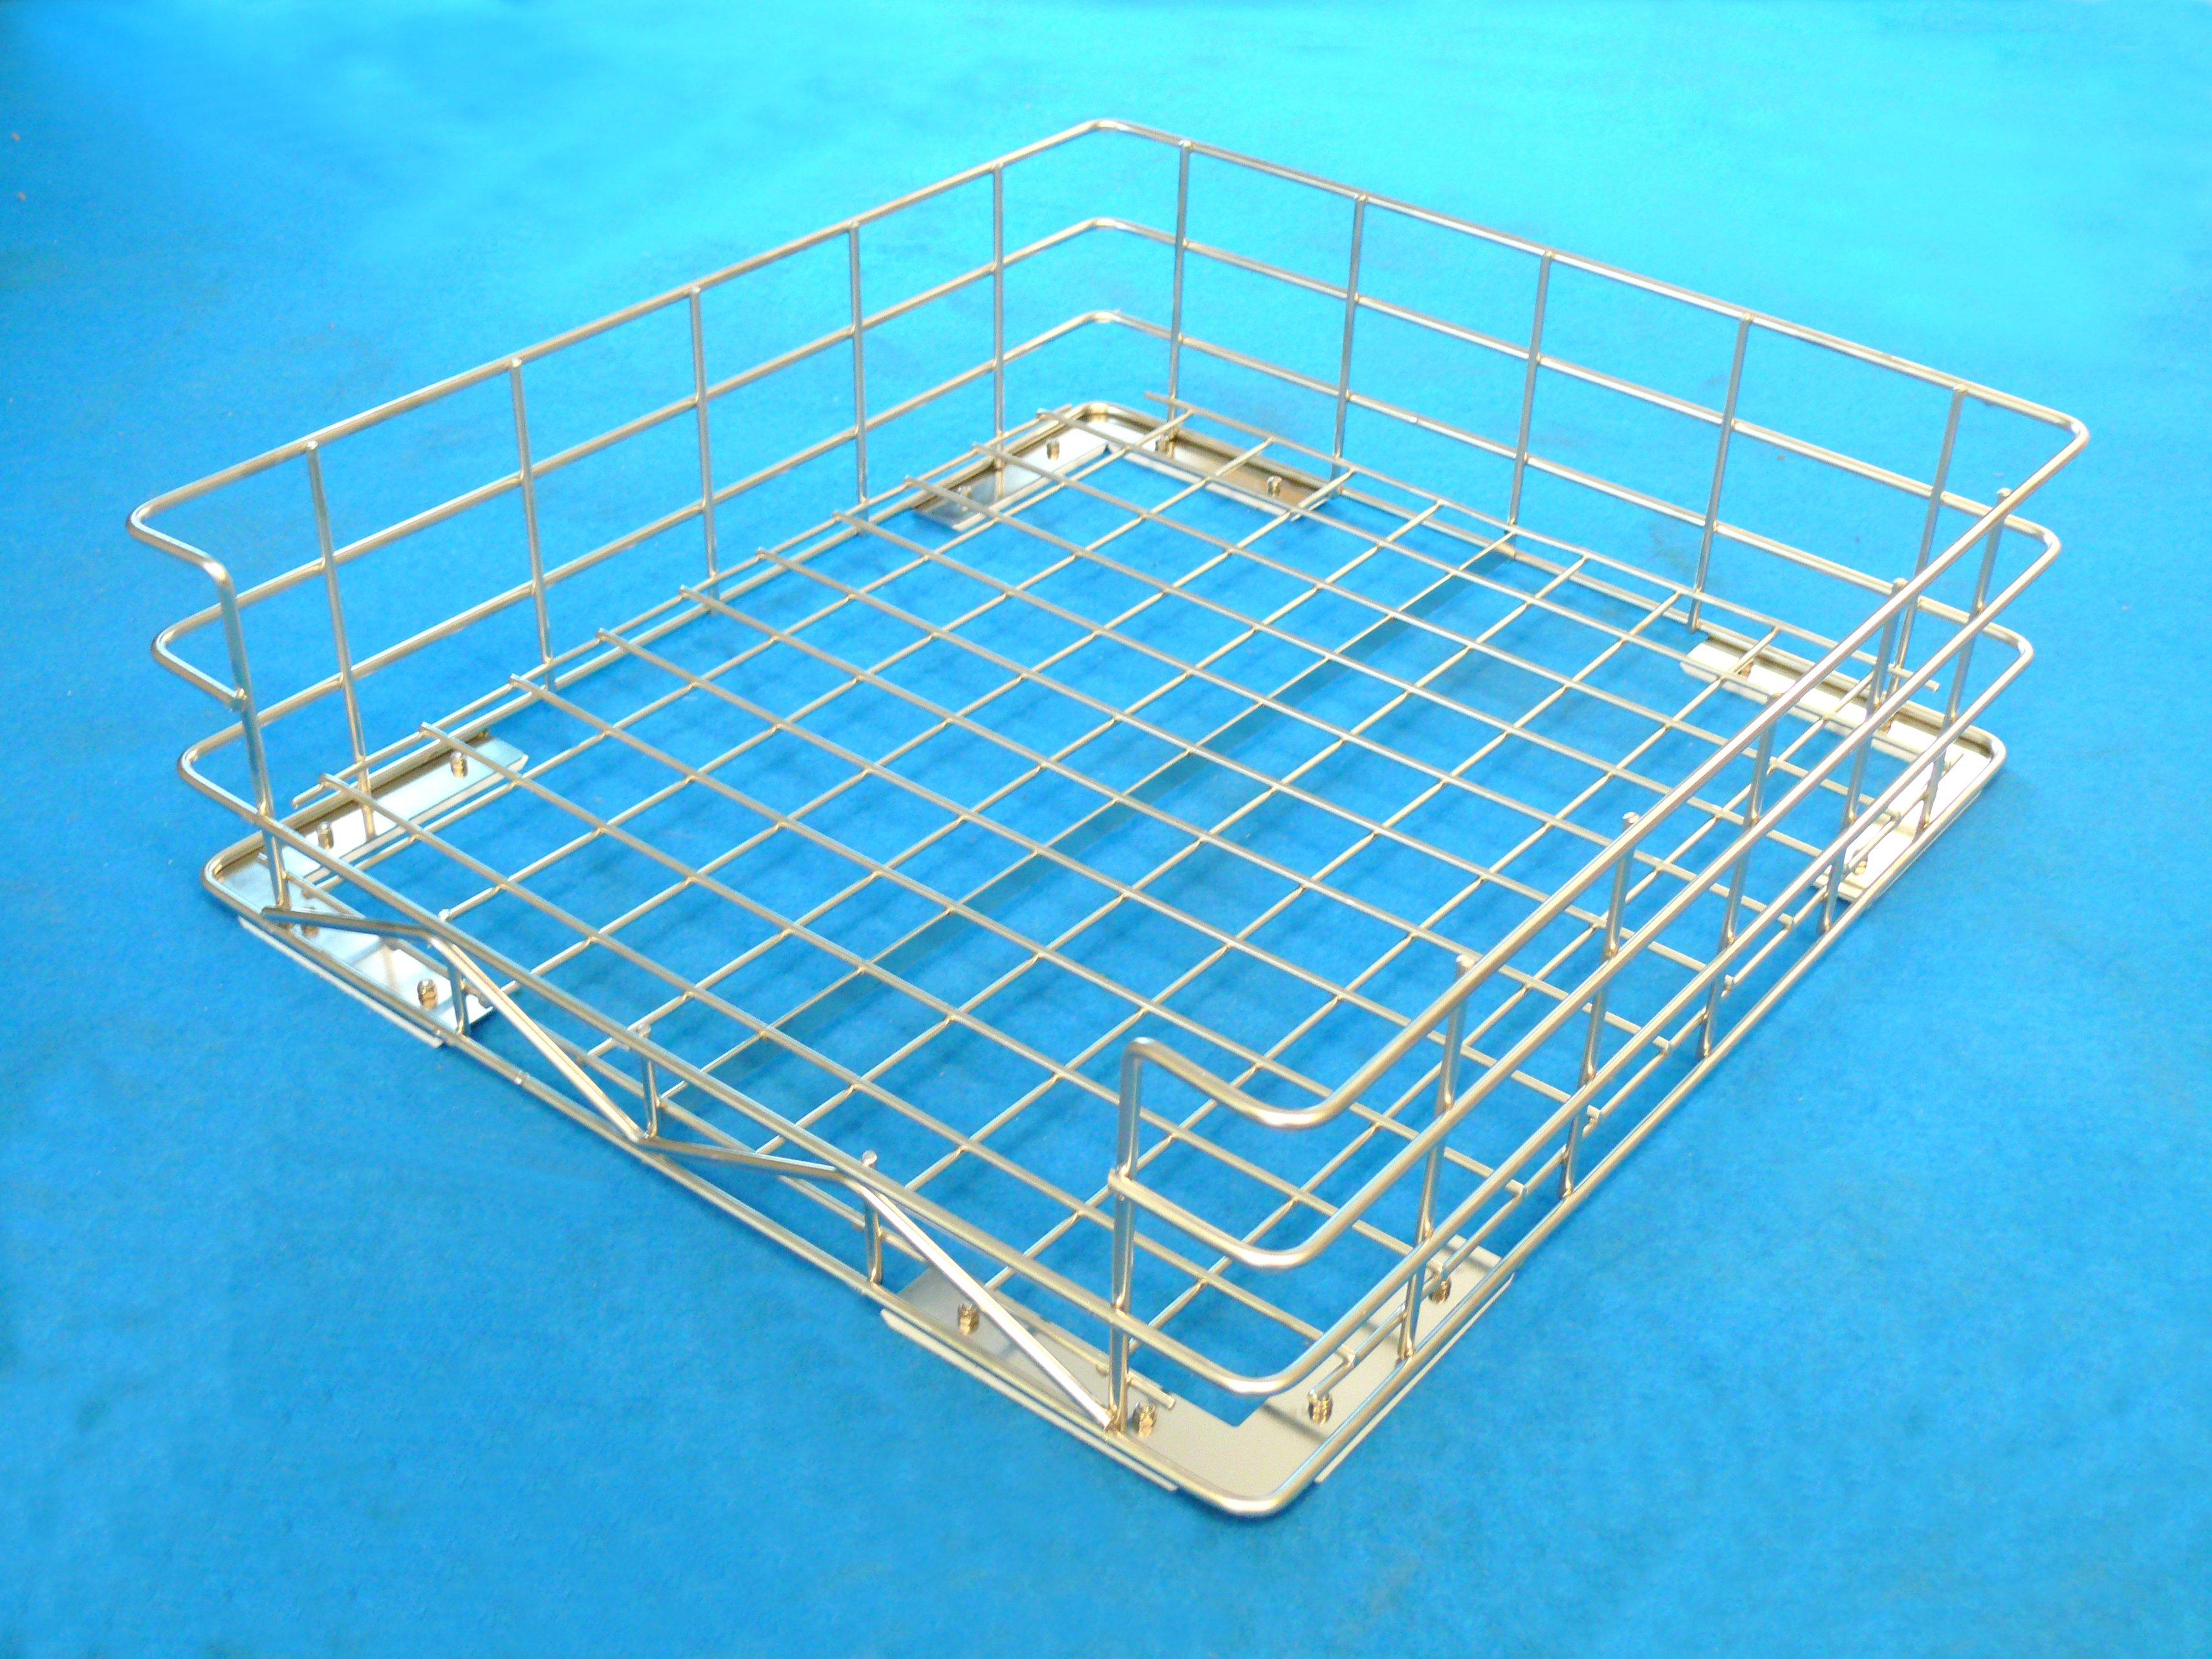 Eurodib USA CC00089 commercial dishwashers & glasswashers - accessories